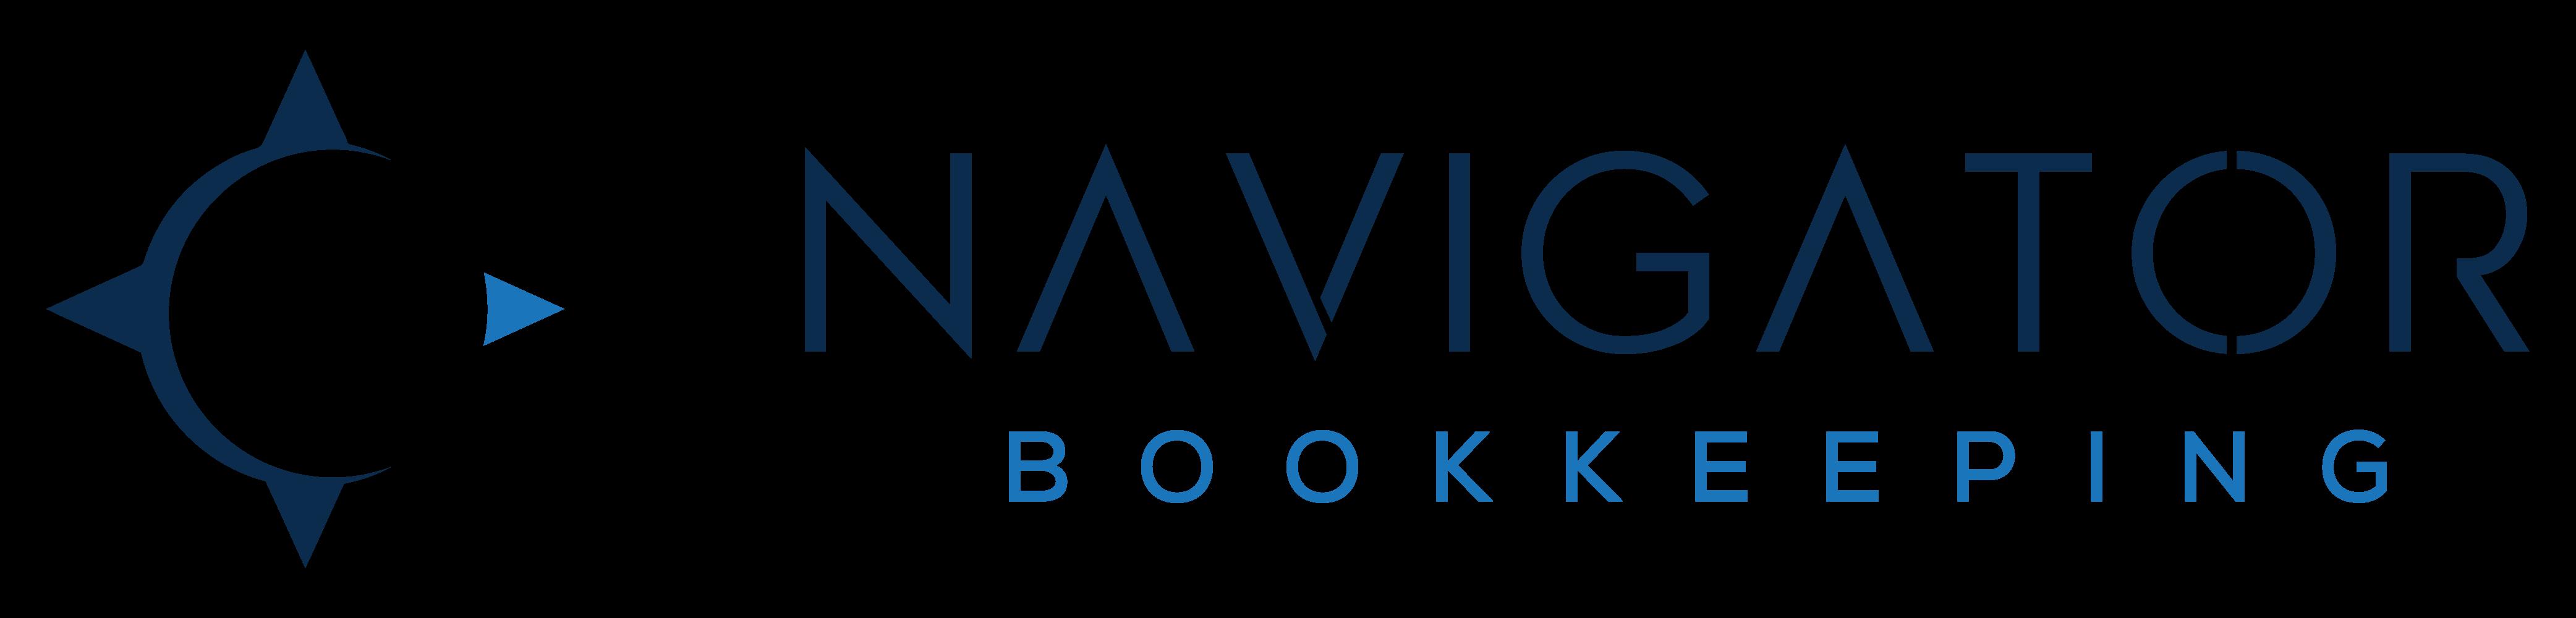 Navigator Bookkeeping